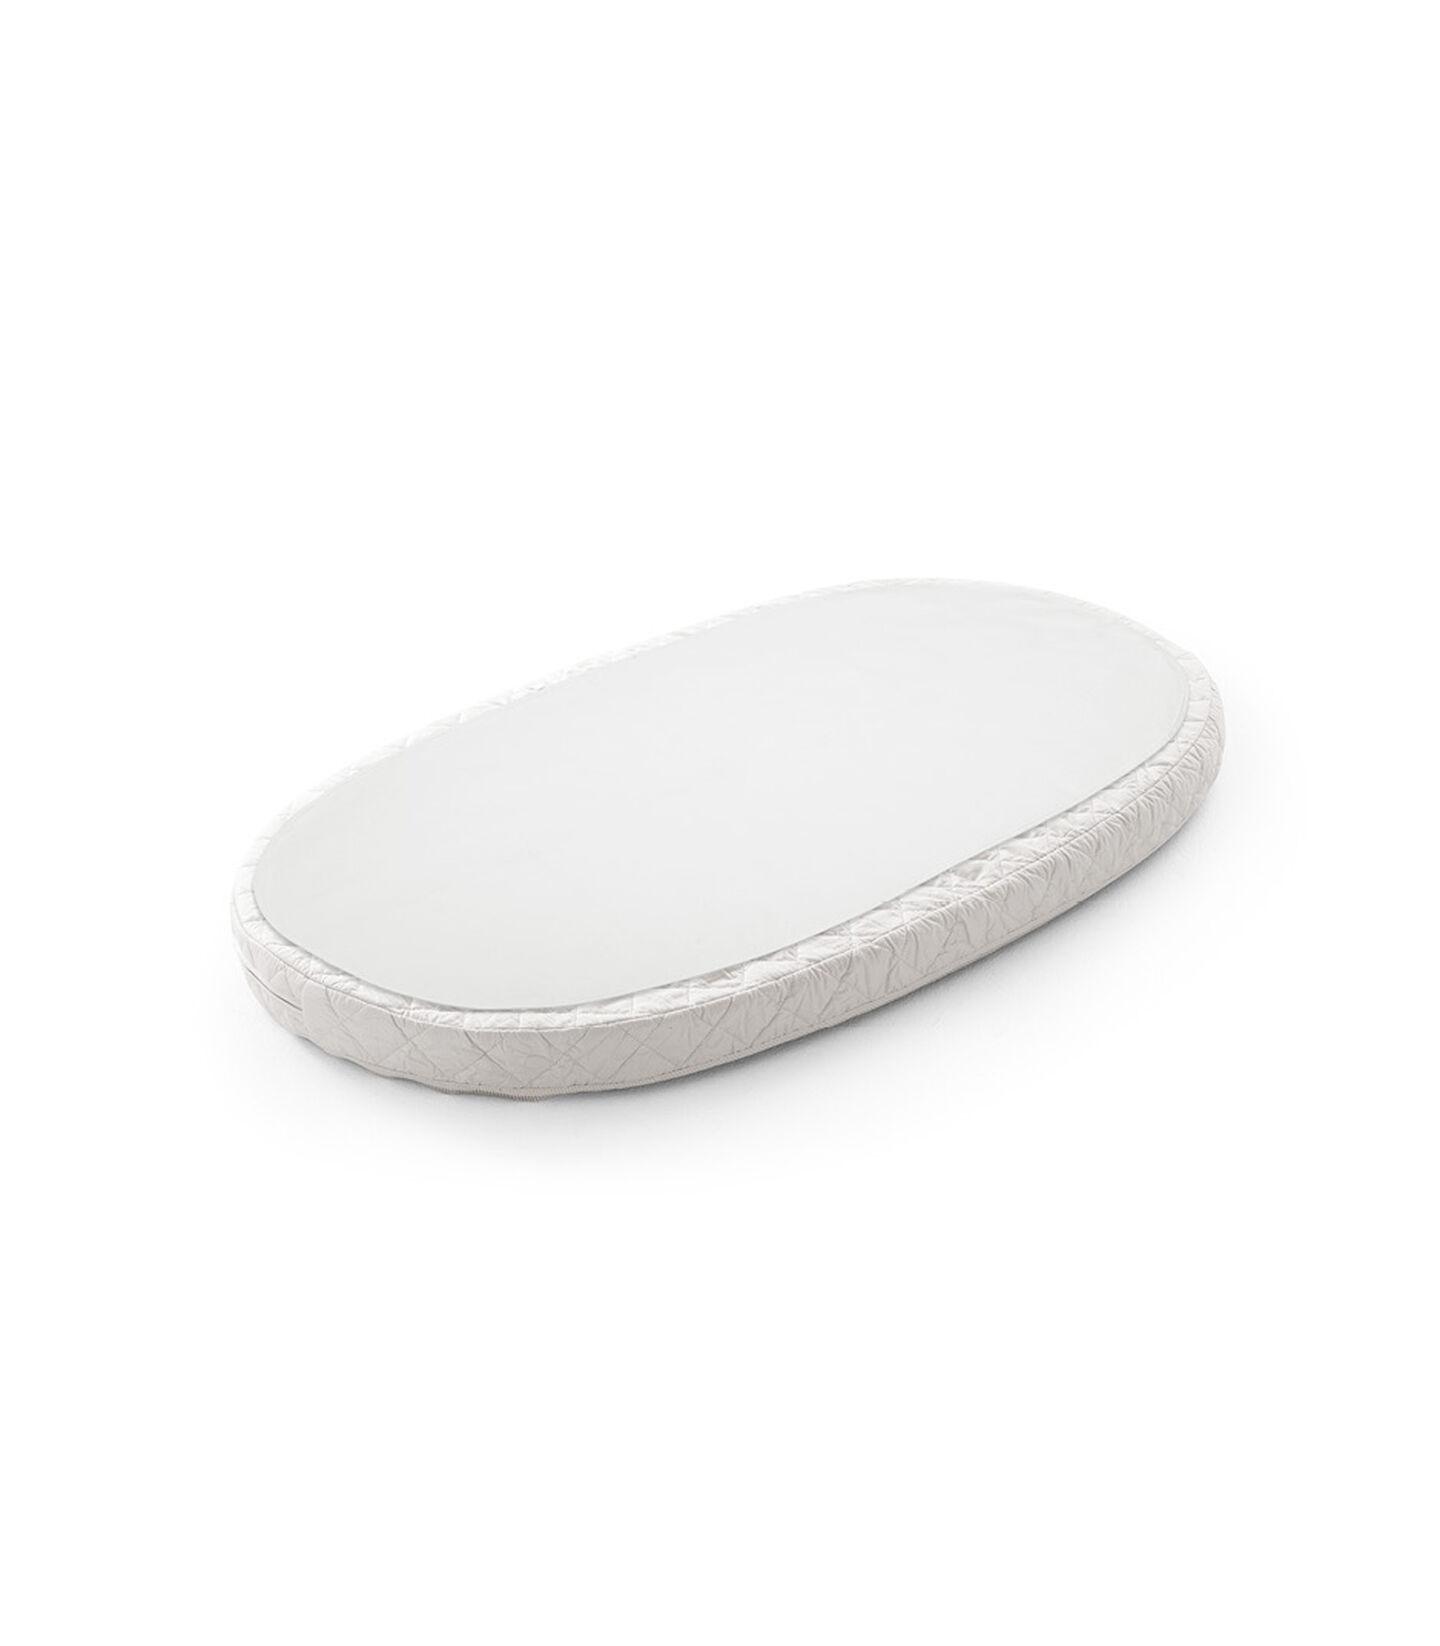 Stokke® Sleepi™ Bed Protection Sheet. White view 2